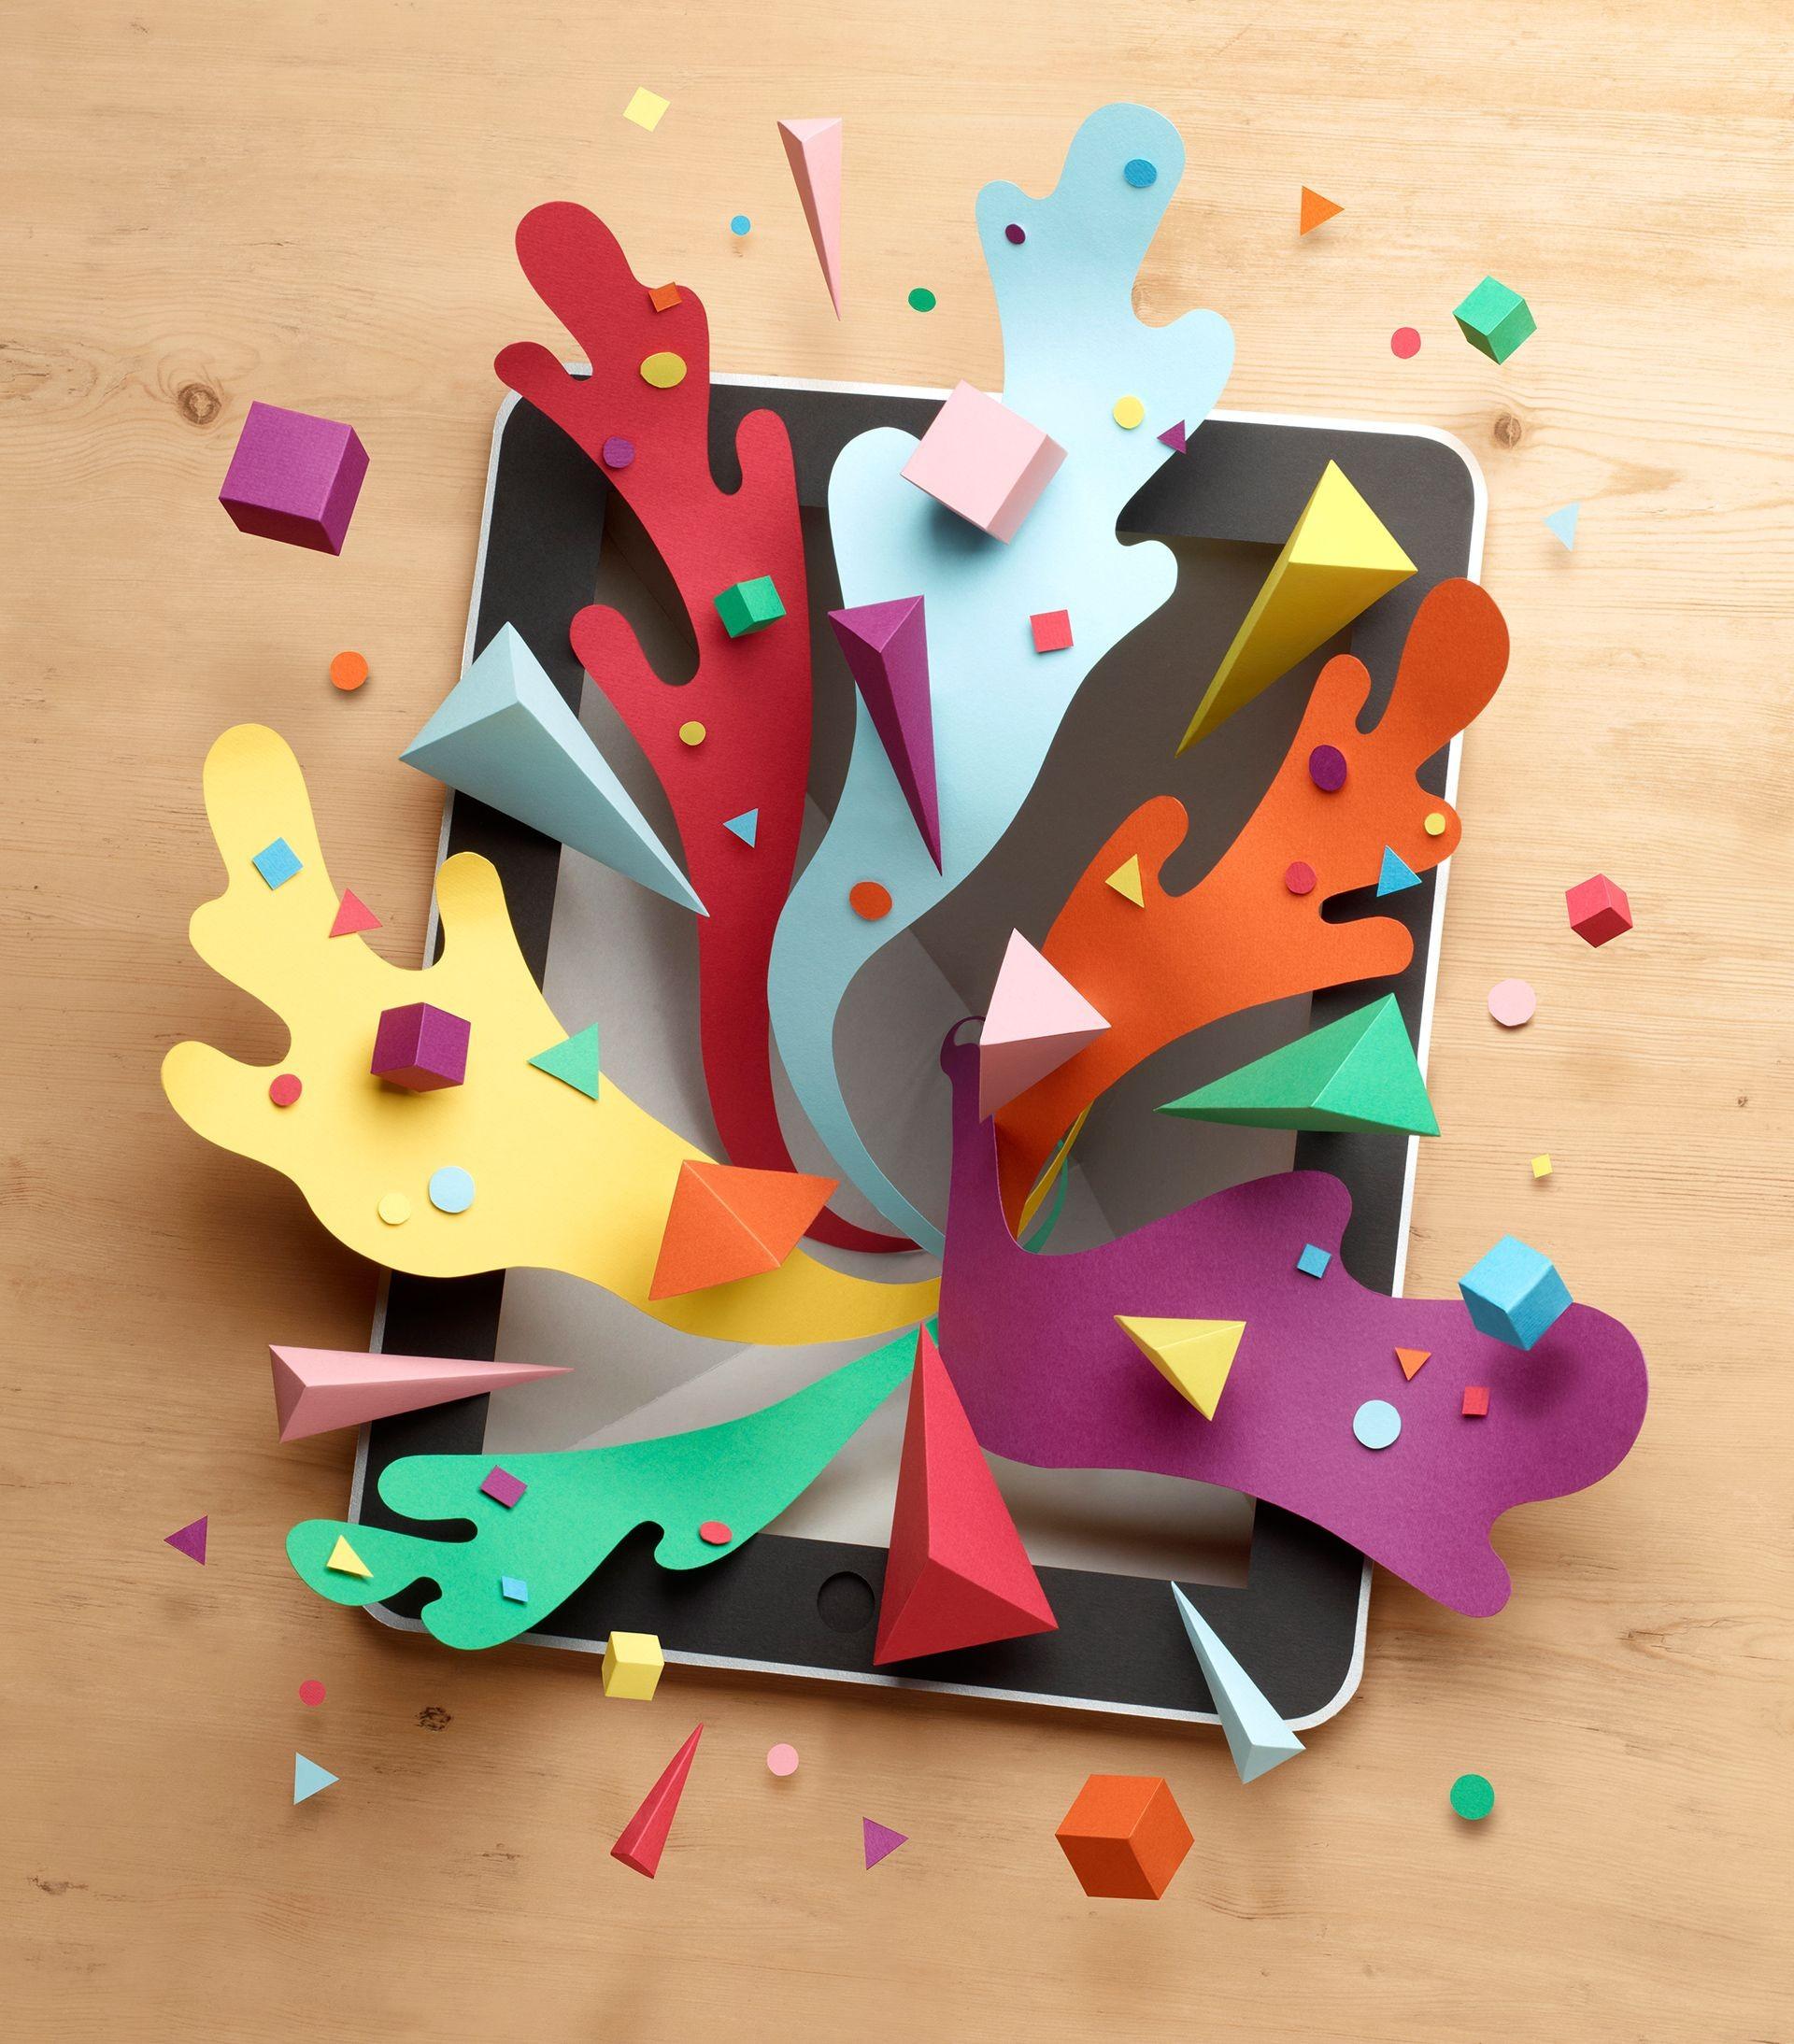 Papercraft Ipad Ipad Explosion by Owen Gildersleeve